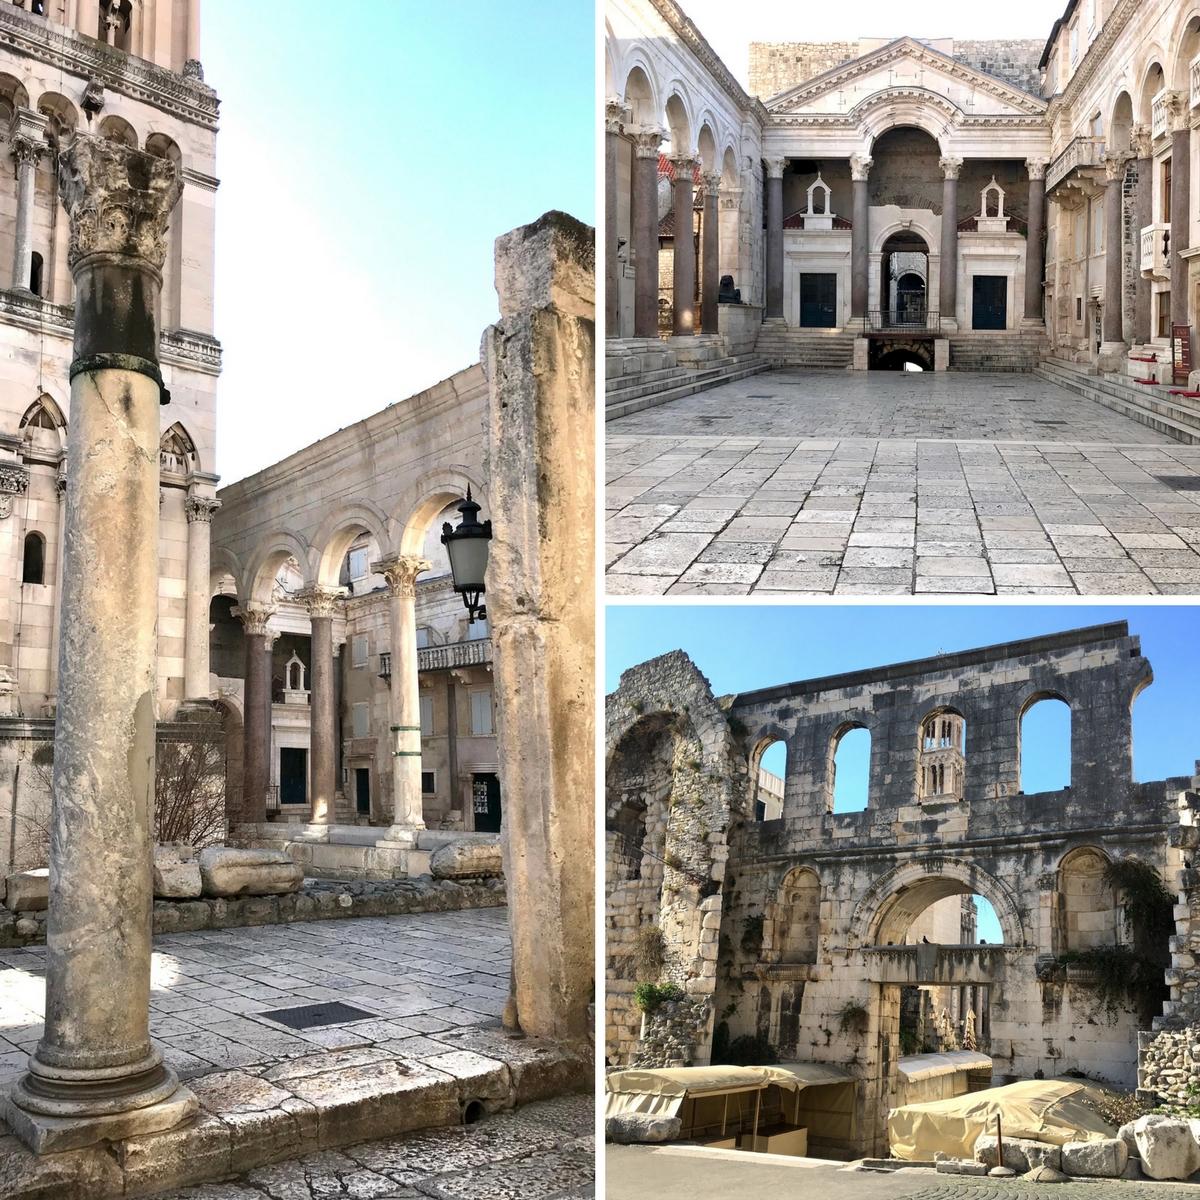 Walking through Diocletian's Palace in Split, Croatia